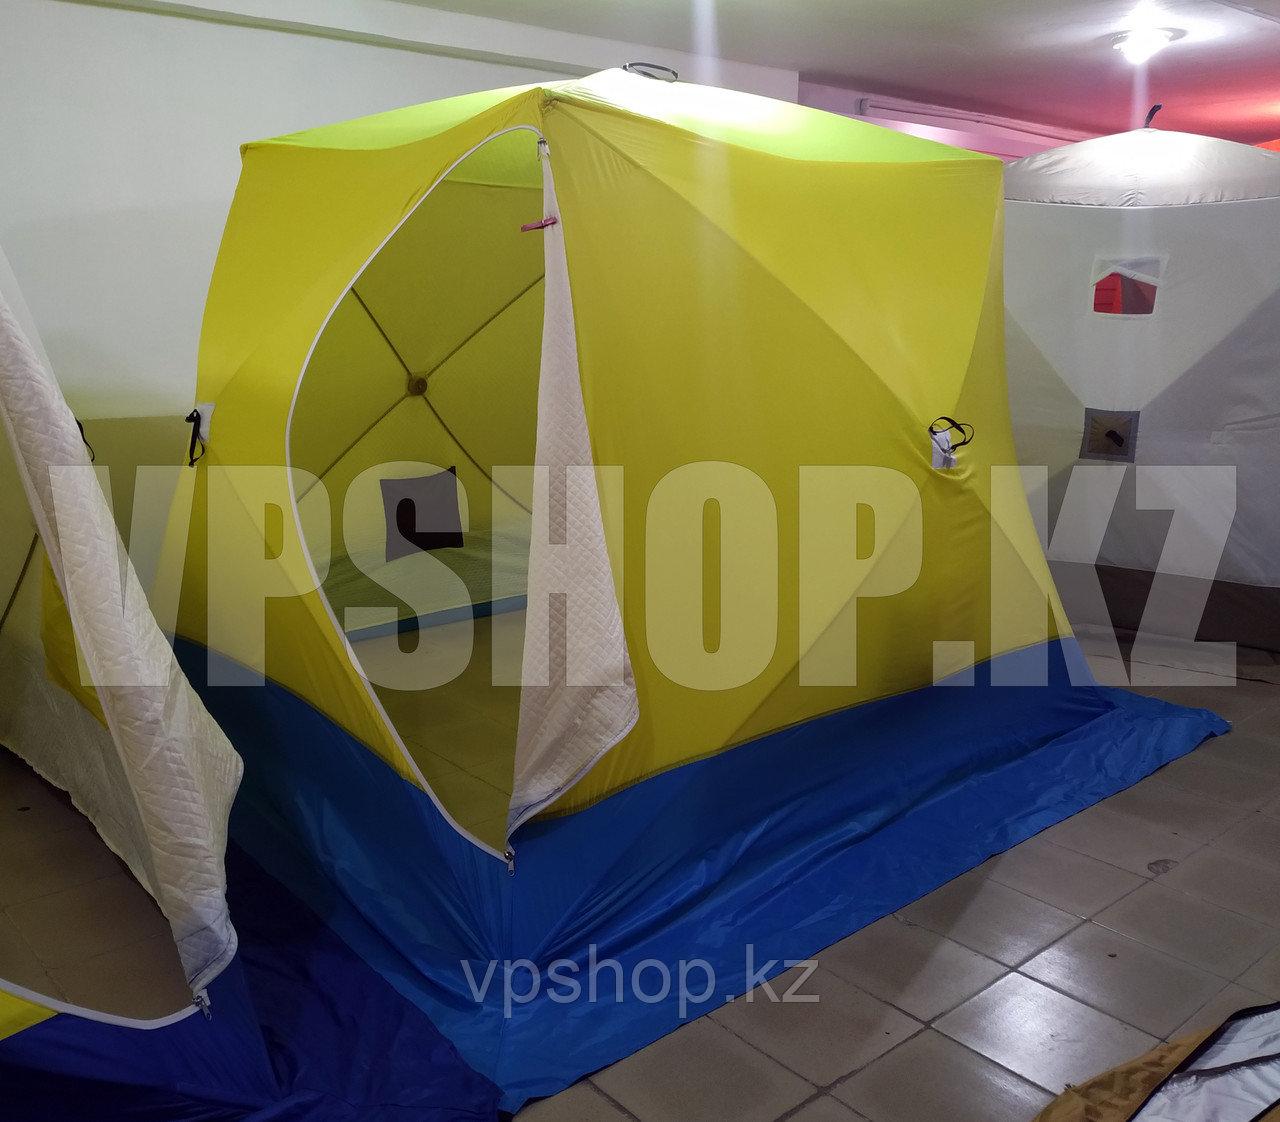 Утепленная палатка СТЭК КУБ-3 Long 3-х слойная палатка для зимней рыбалки на синтепоном 220х250х200